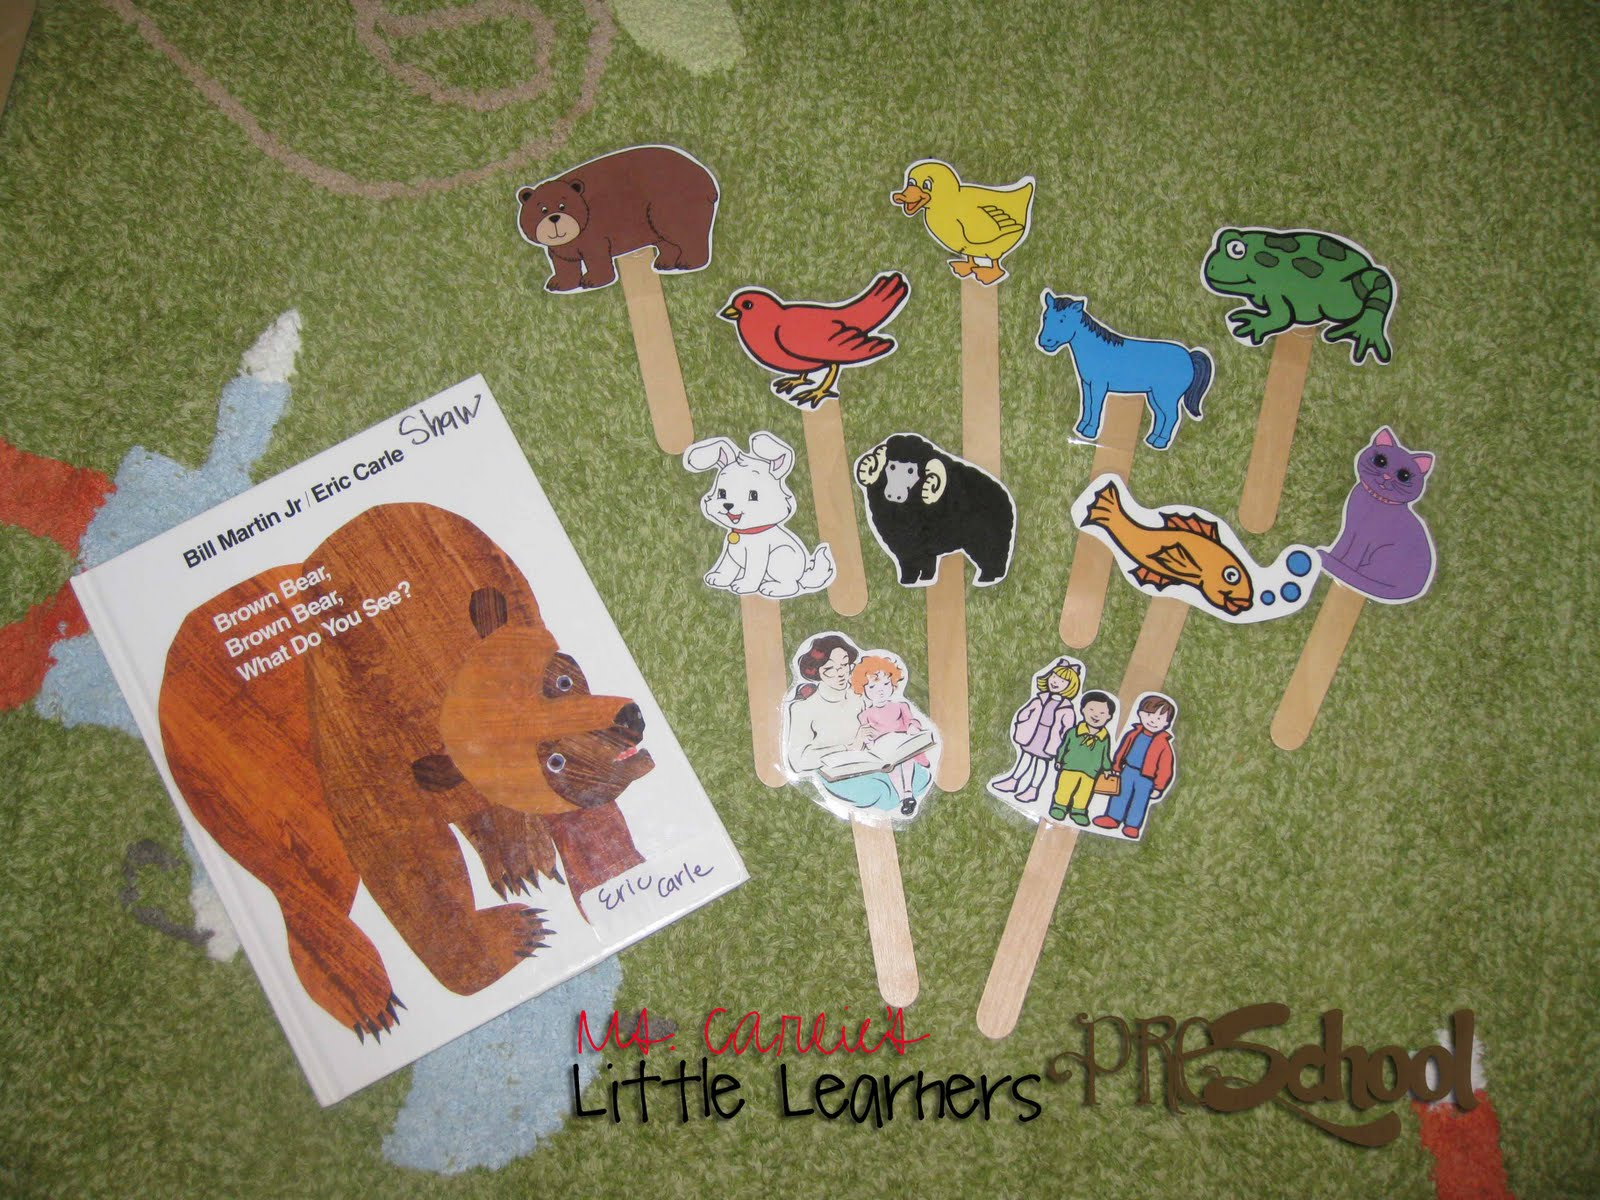 Ms Carlie S Little Learners Preschool September Week Two